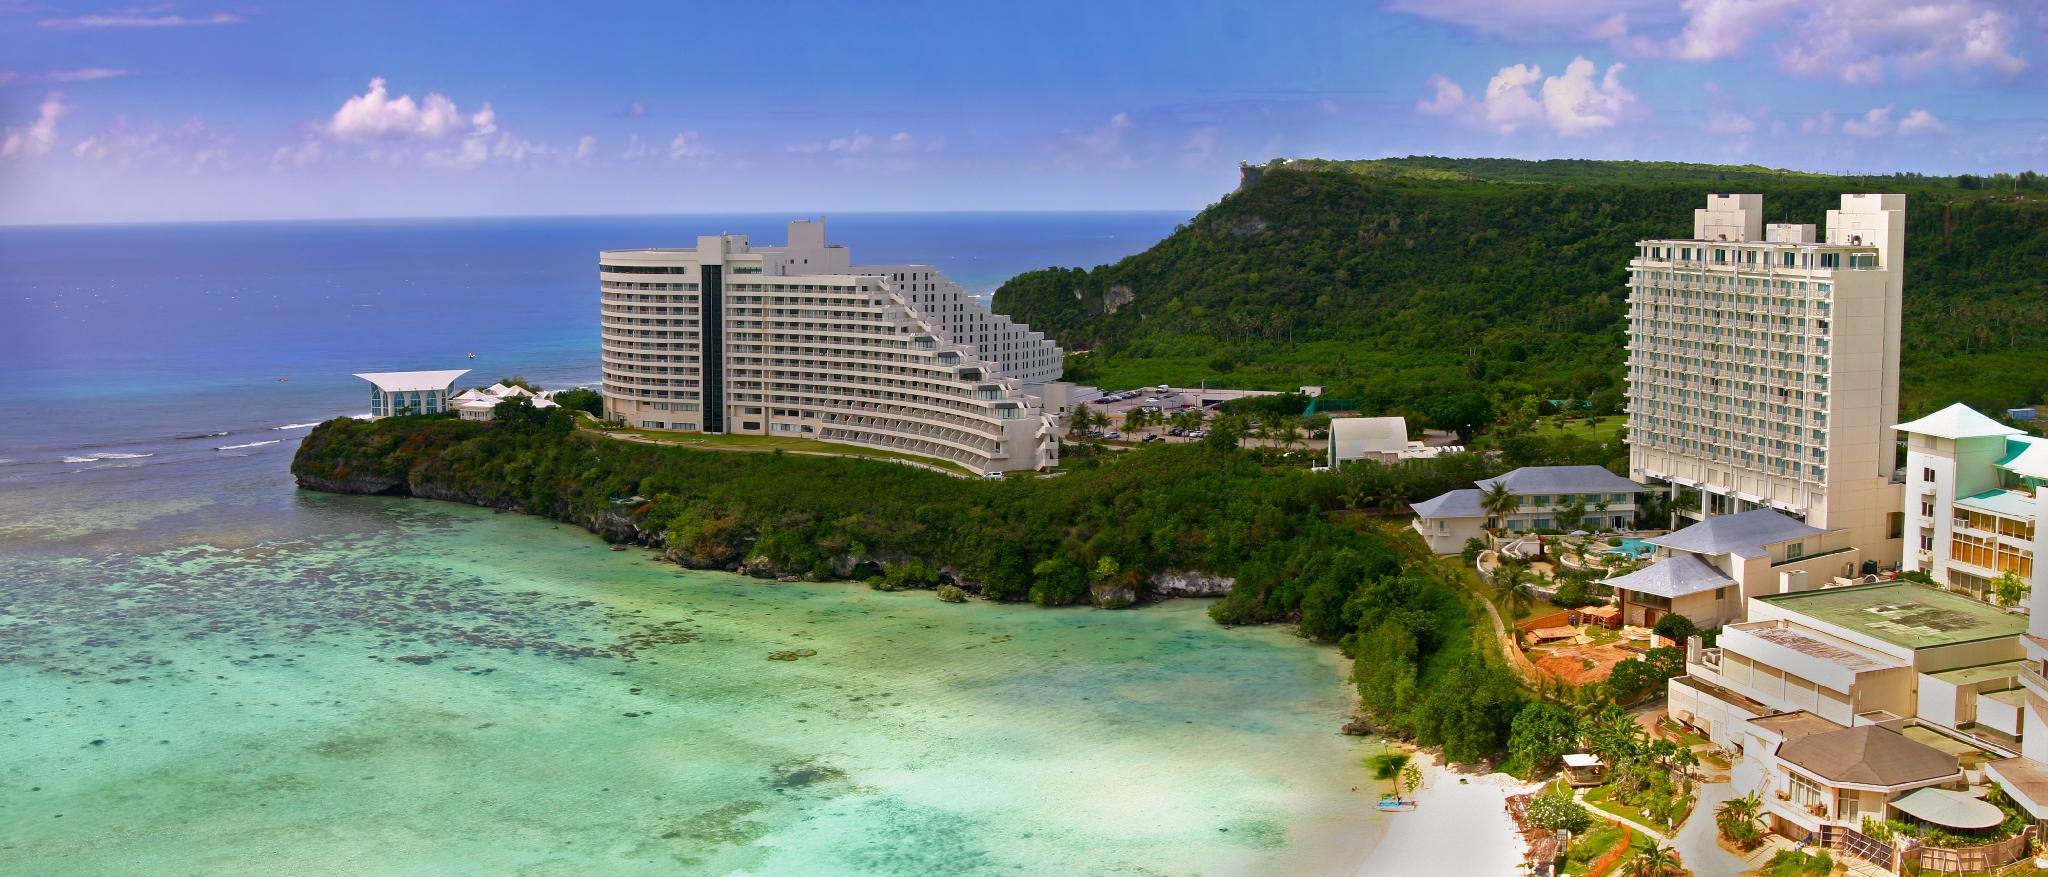 Guam Hotels Guam Great Savings And Real Reviews